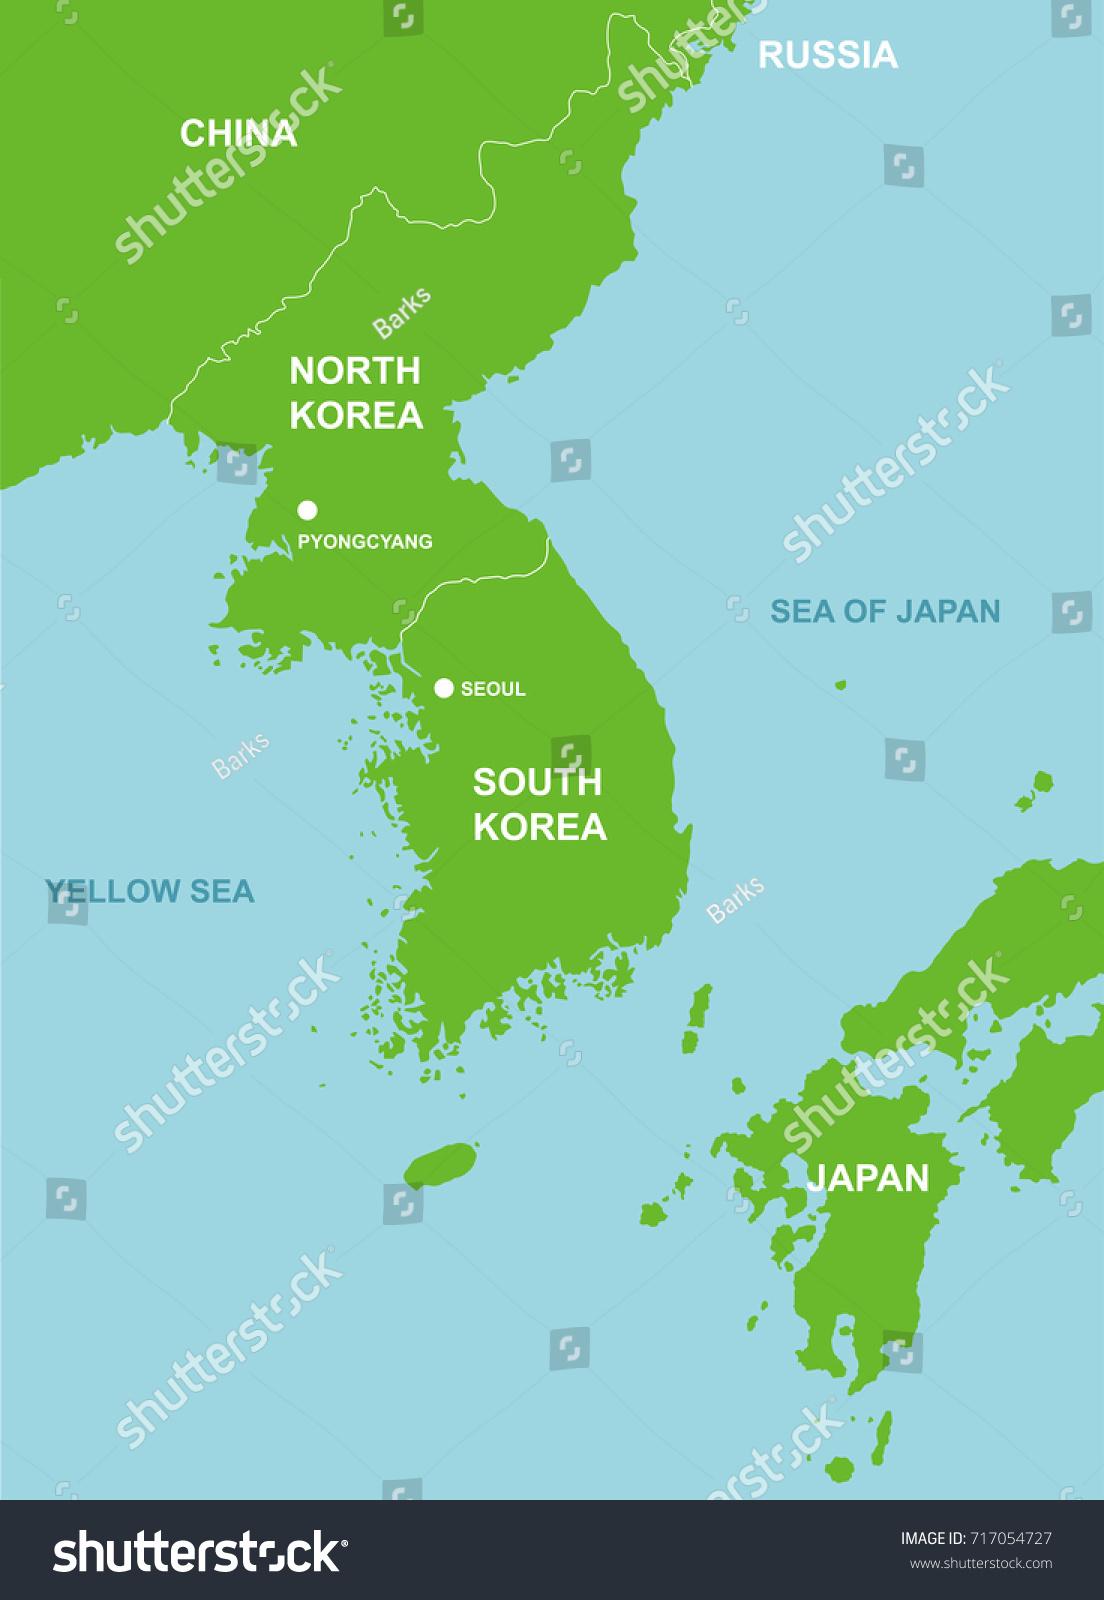 North Korea Surrounding Countries Map Stock Vector (Royalty Free ...